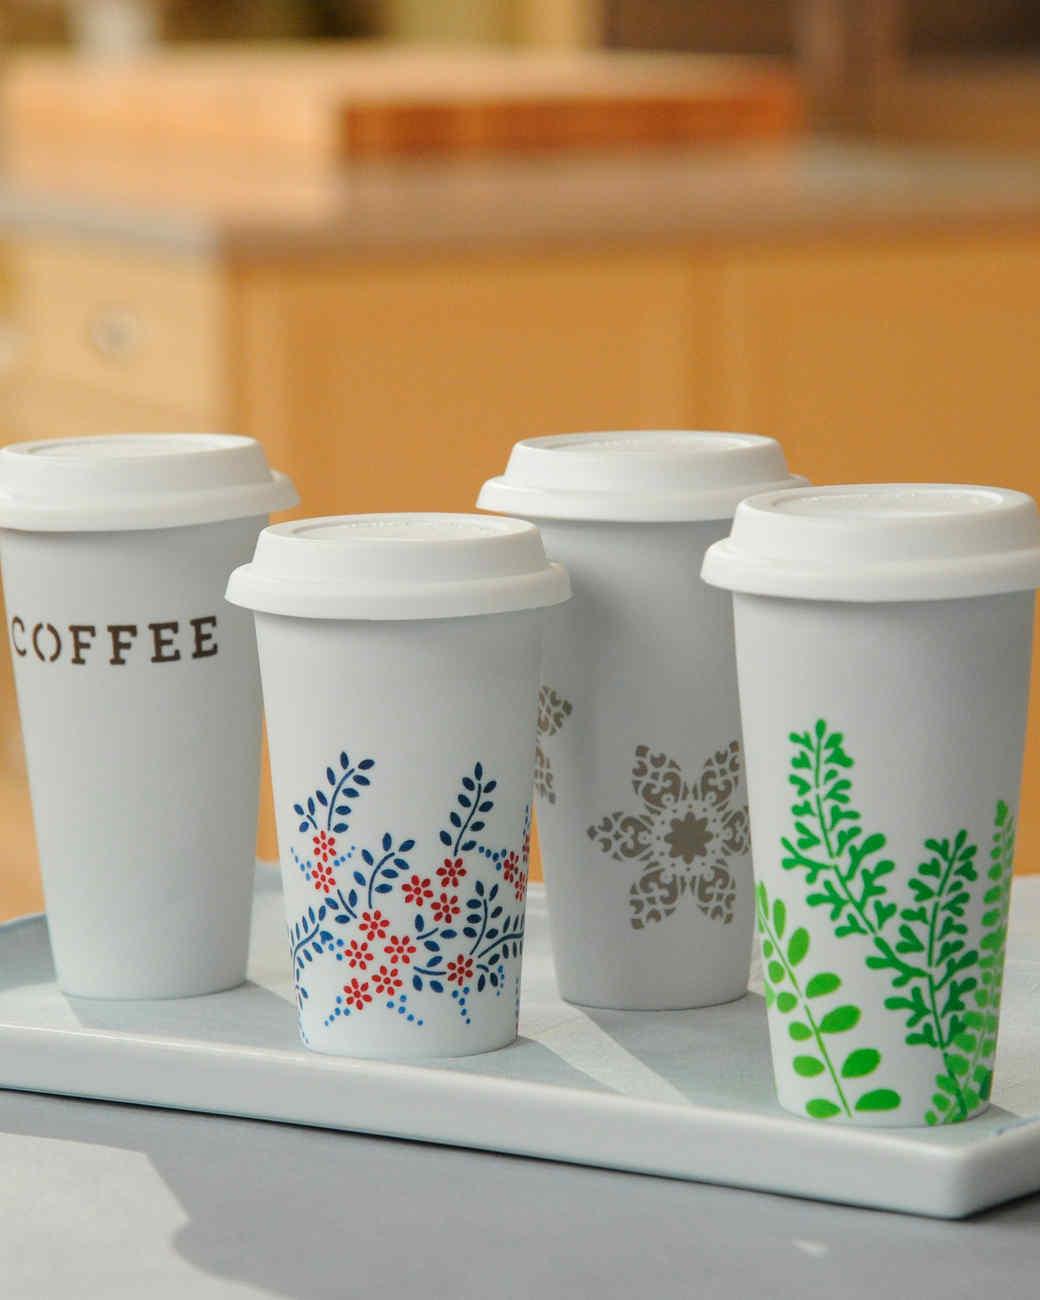 Fullsize Of Coffee Cup Design Ideas